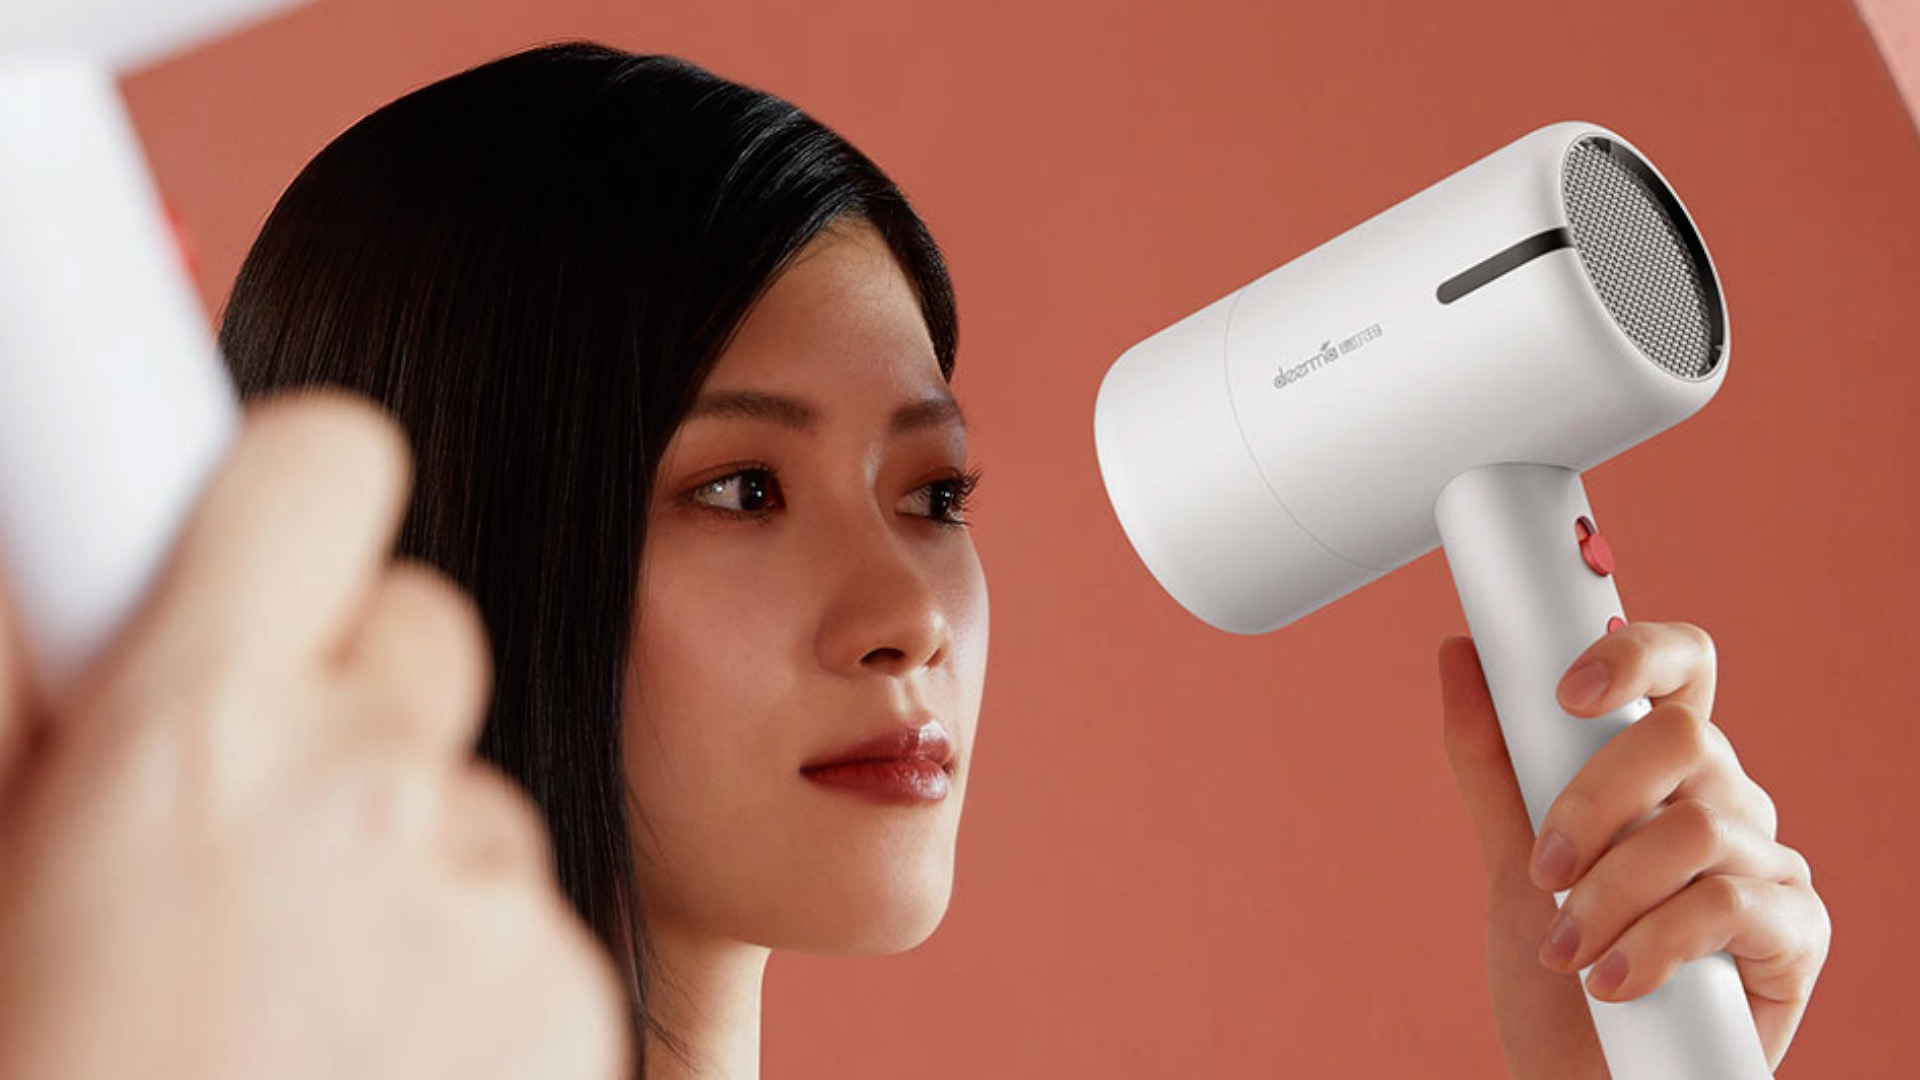 xiaomi deerma multifunctional hair dryer